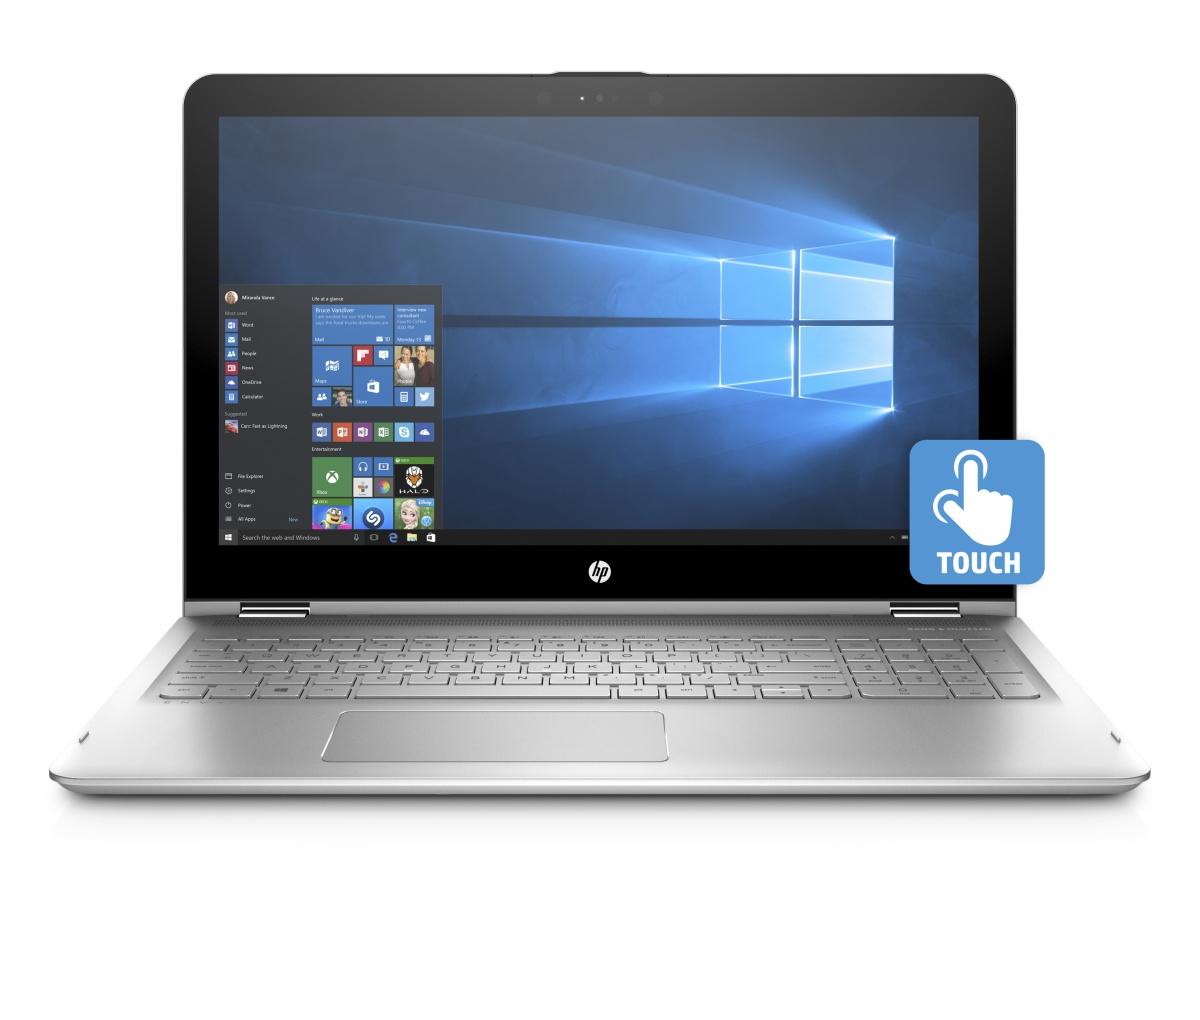 093-001453 - HP Envy x360 15-aq101nc FHD i5-7200U/8GB/1TB+128SSD/2RServis/W10-silver